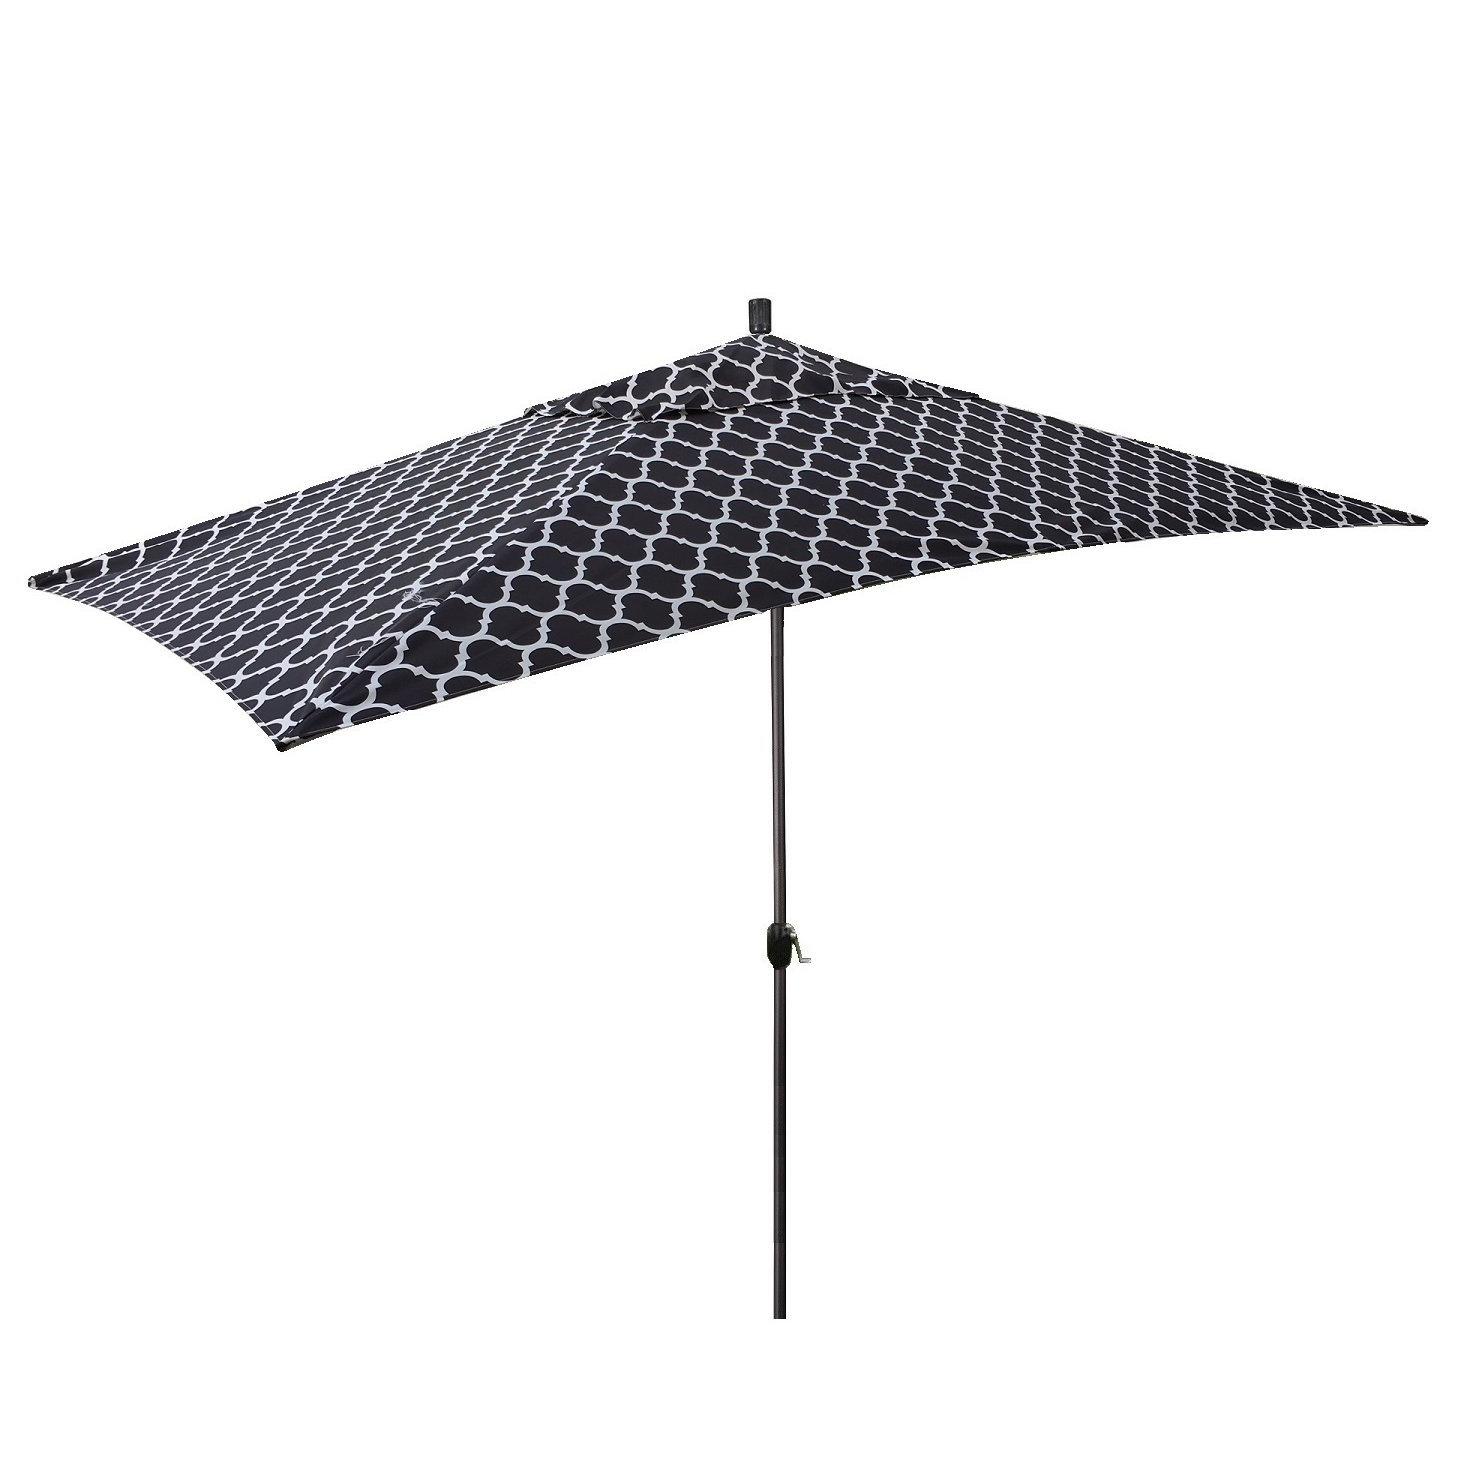 Sherlyn 10' X 6' Rectangular Market Umbrella Pertaining To Popular Devansh Market Umbrellas (View 16 of 20)